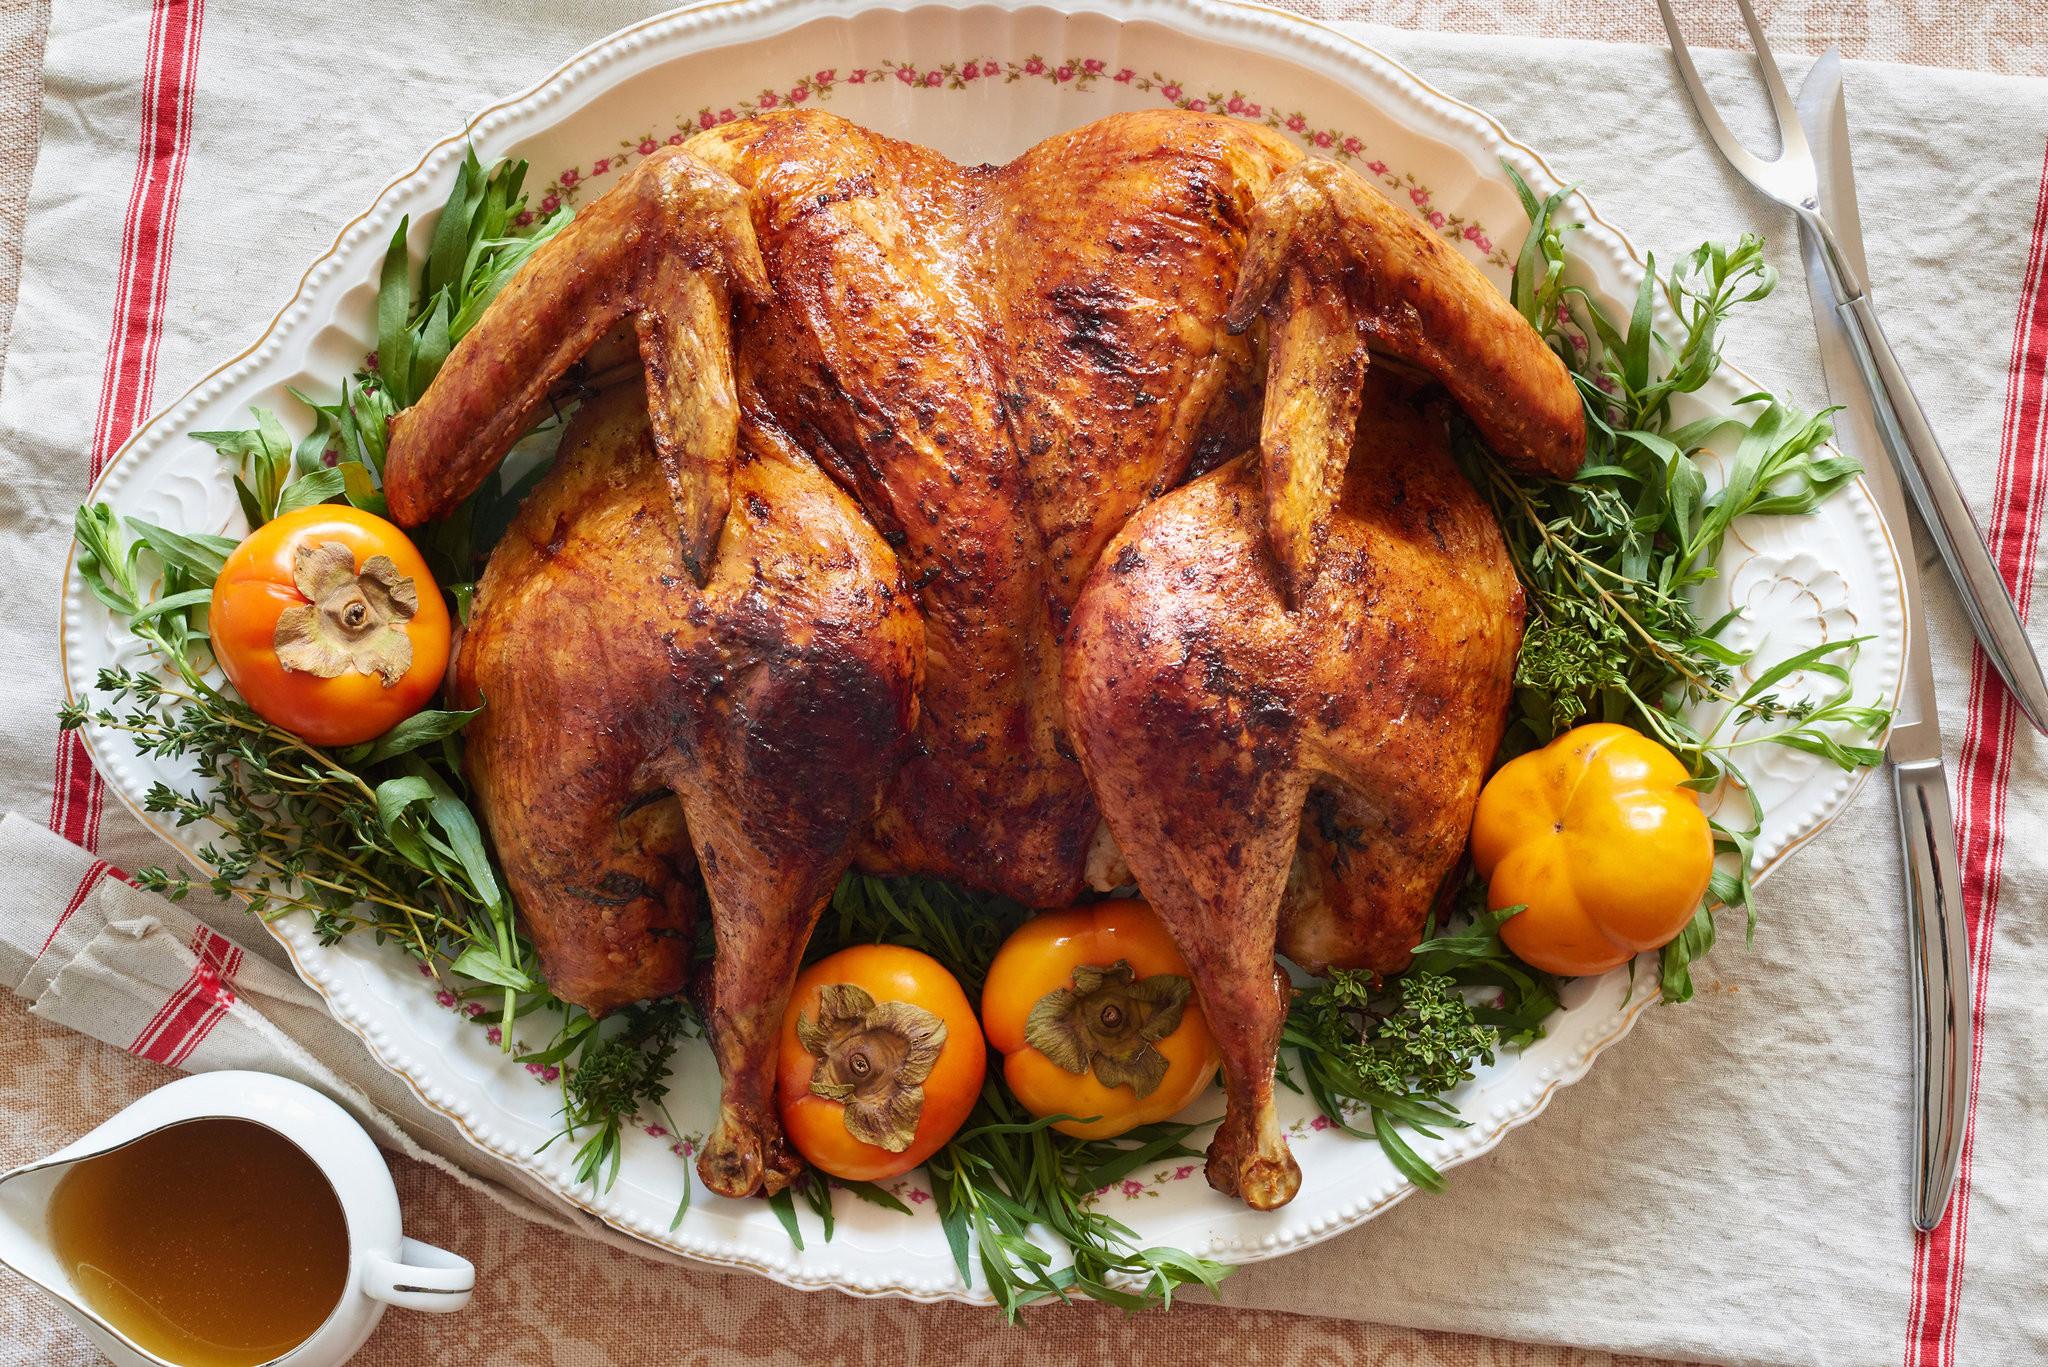 Bake Turkey Recipe For Thanksgiving  45 Minute Roast Turkey Recipe NYT Cooking